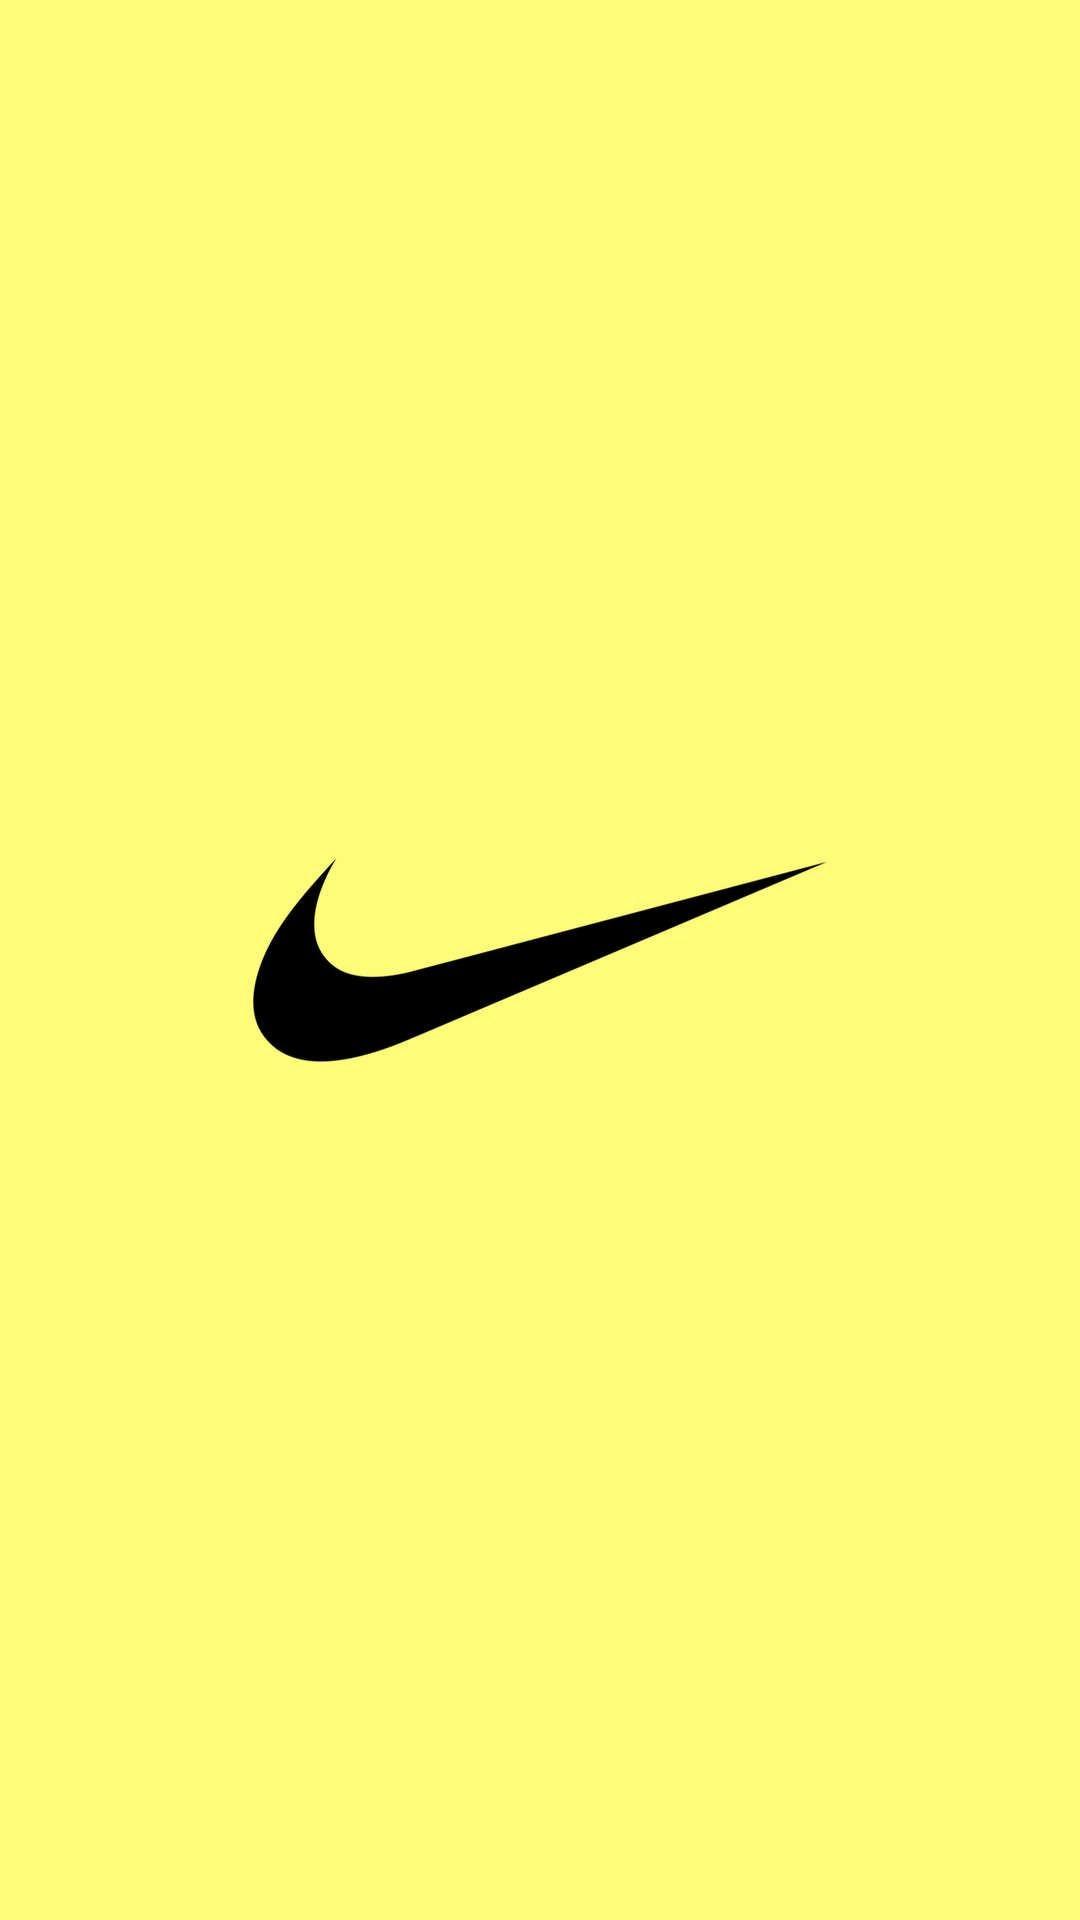 Res: 1080x1920, NIKE Logo iPhone Wallpaper